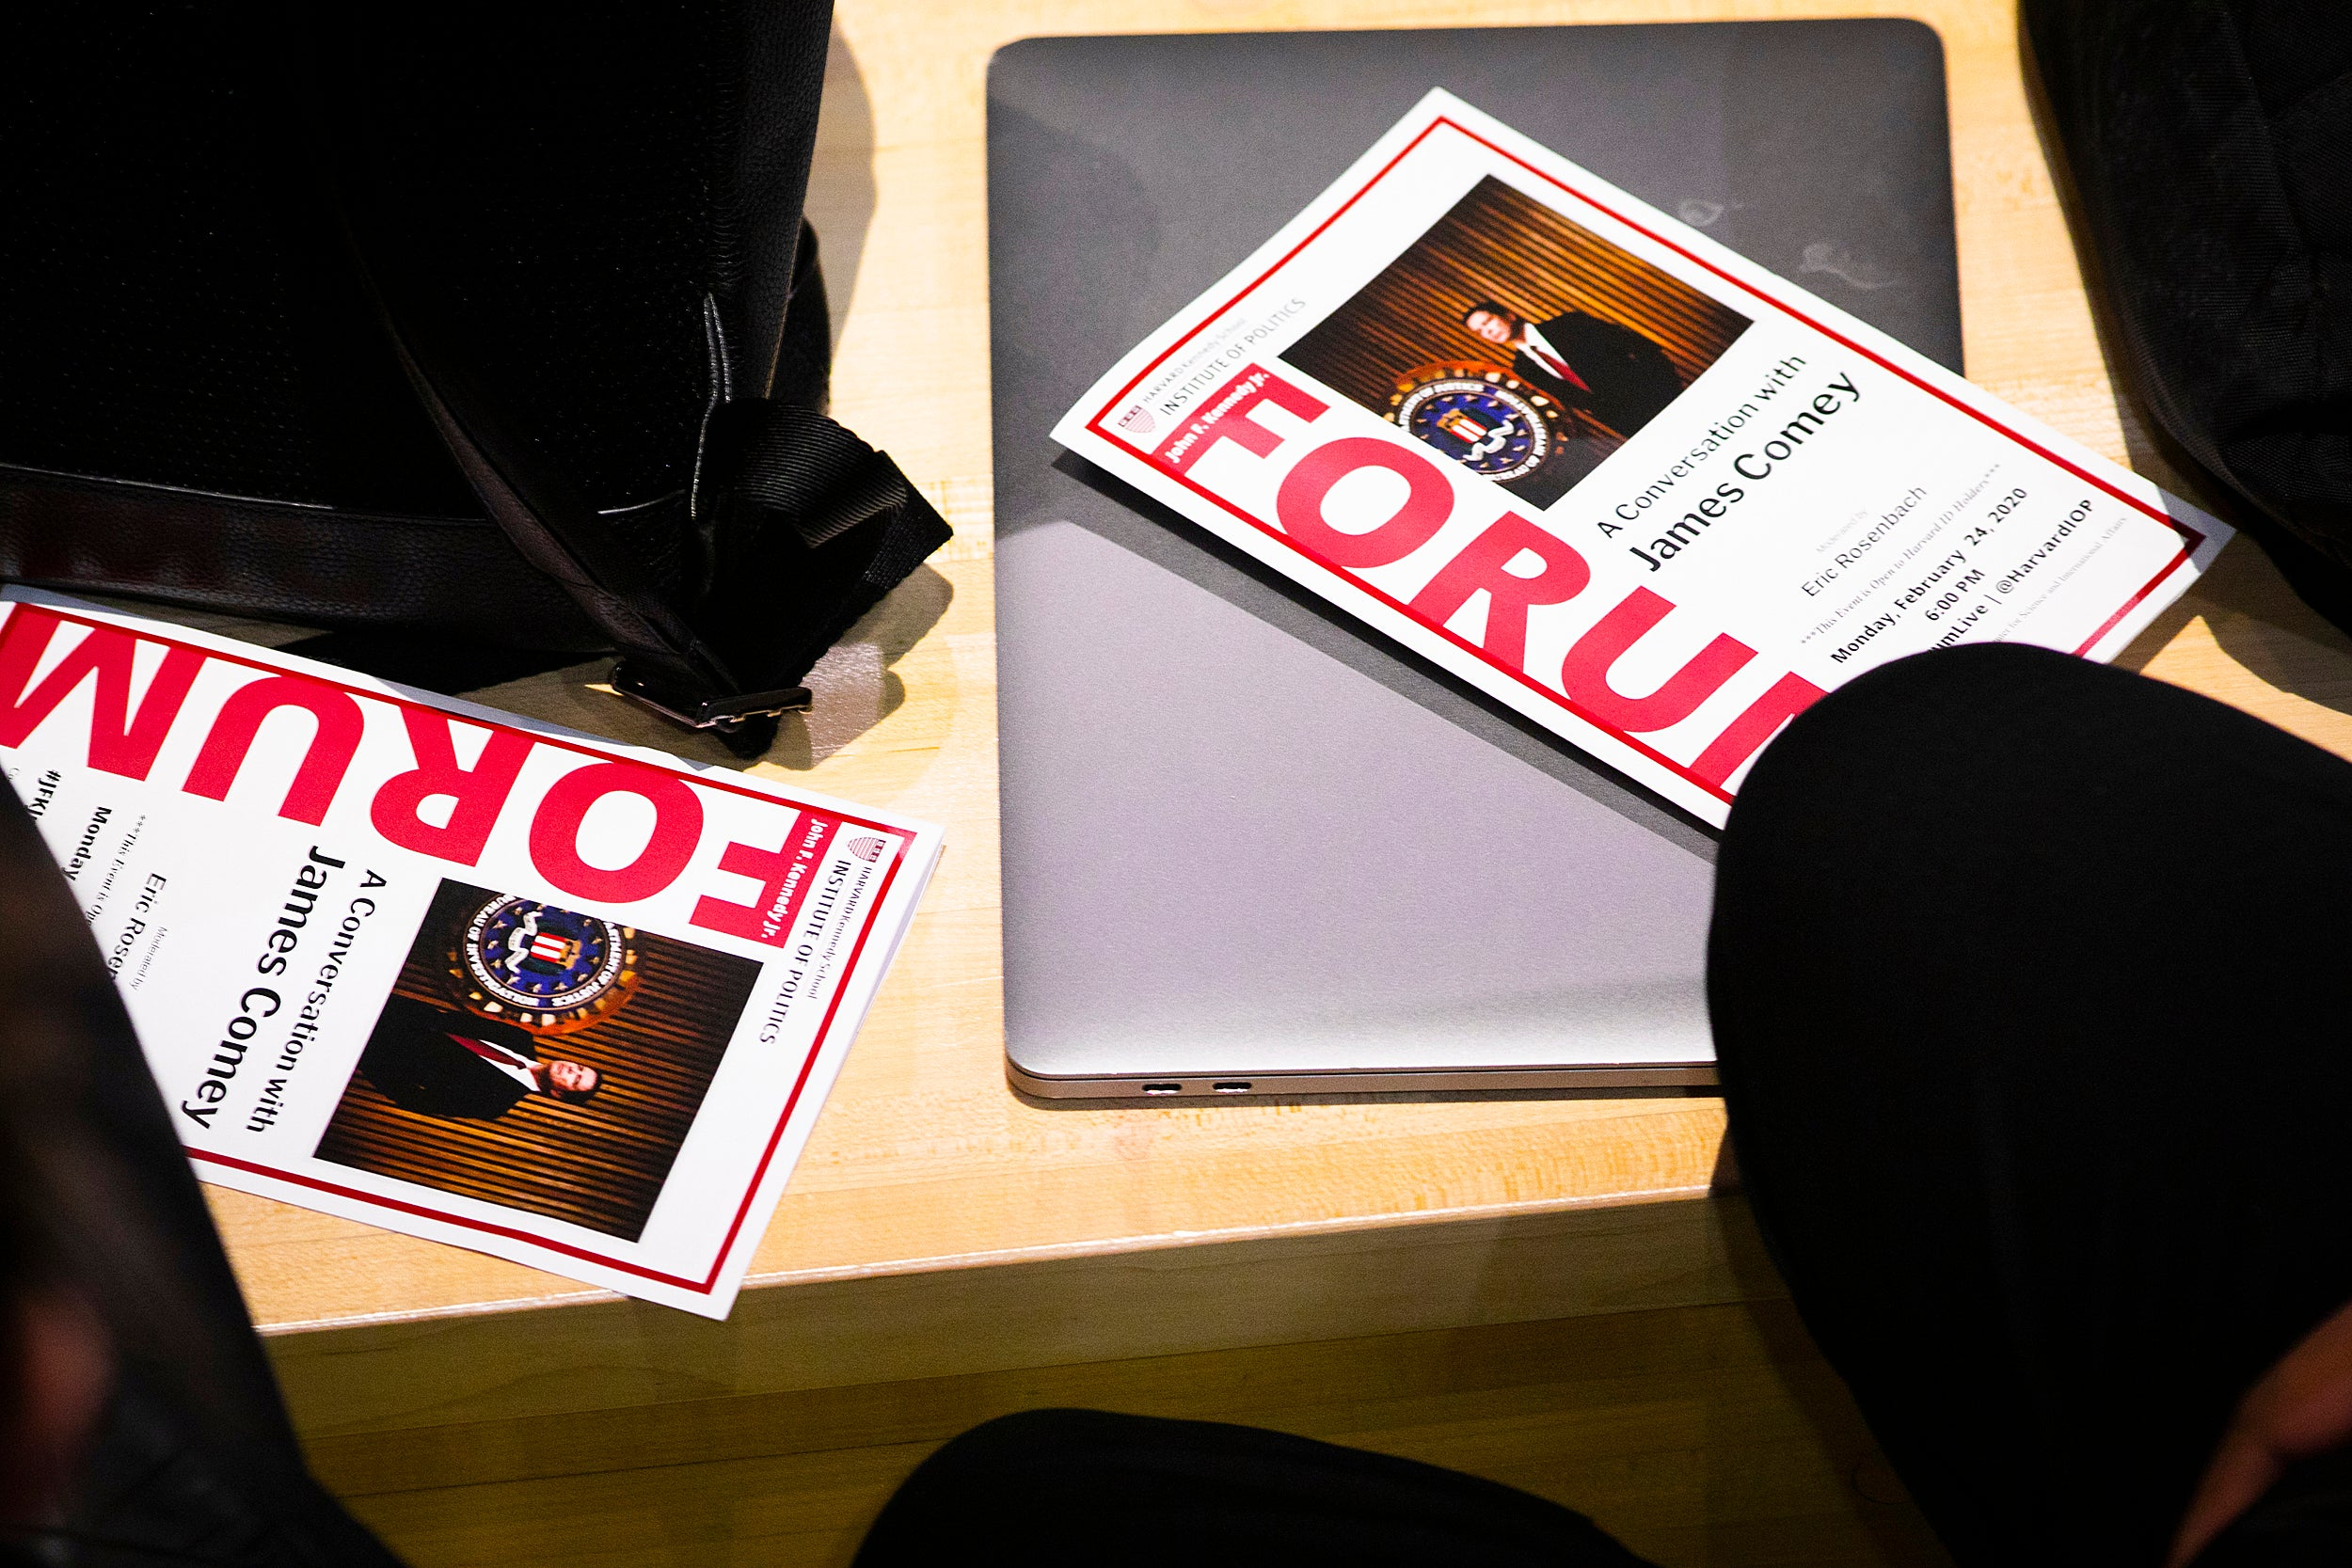 Forum program on table.